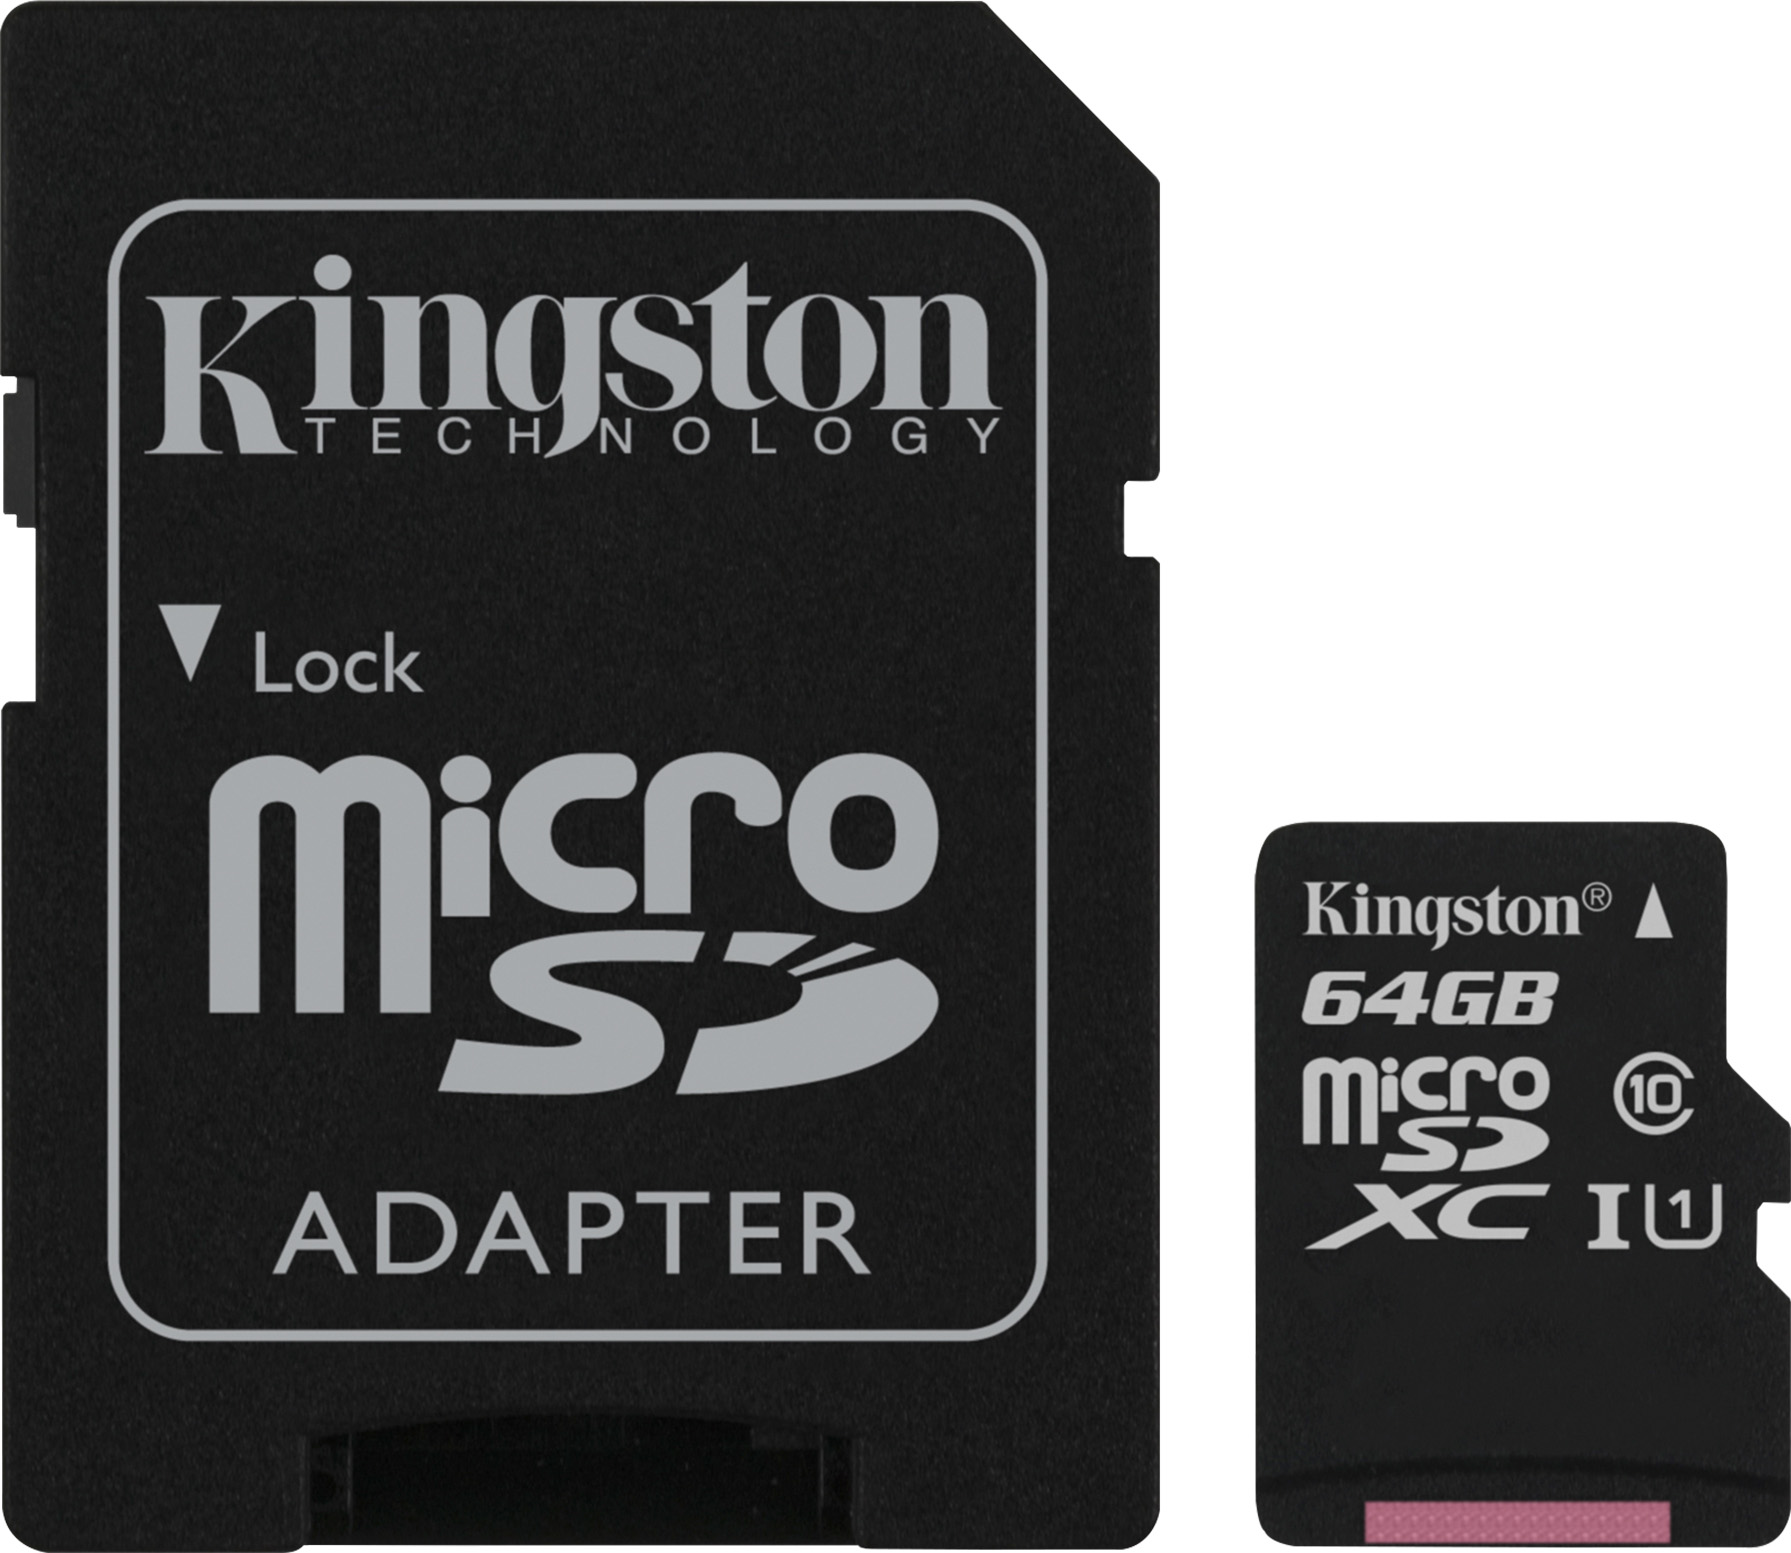 Kingston 64GB microSDHC Class 10 Flash Card + SD Adapter